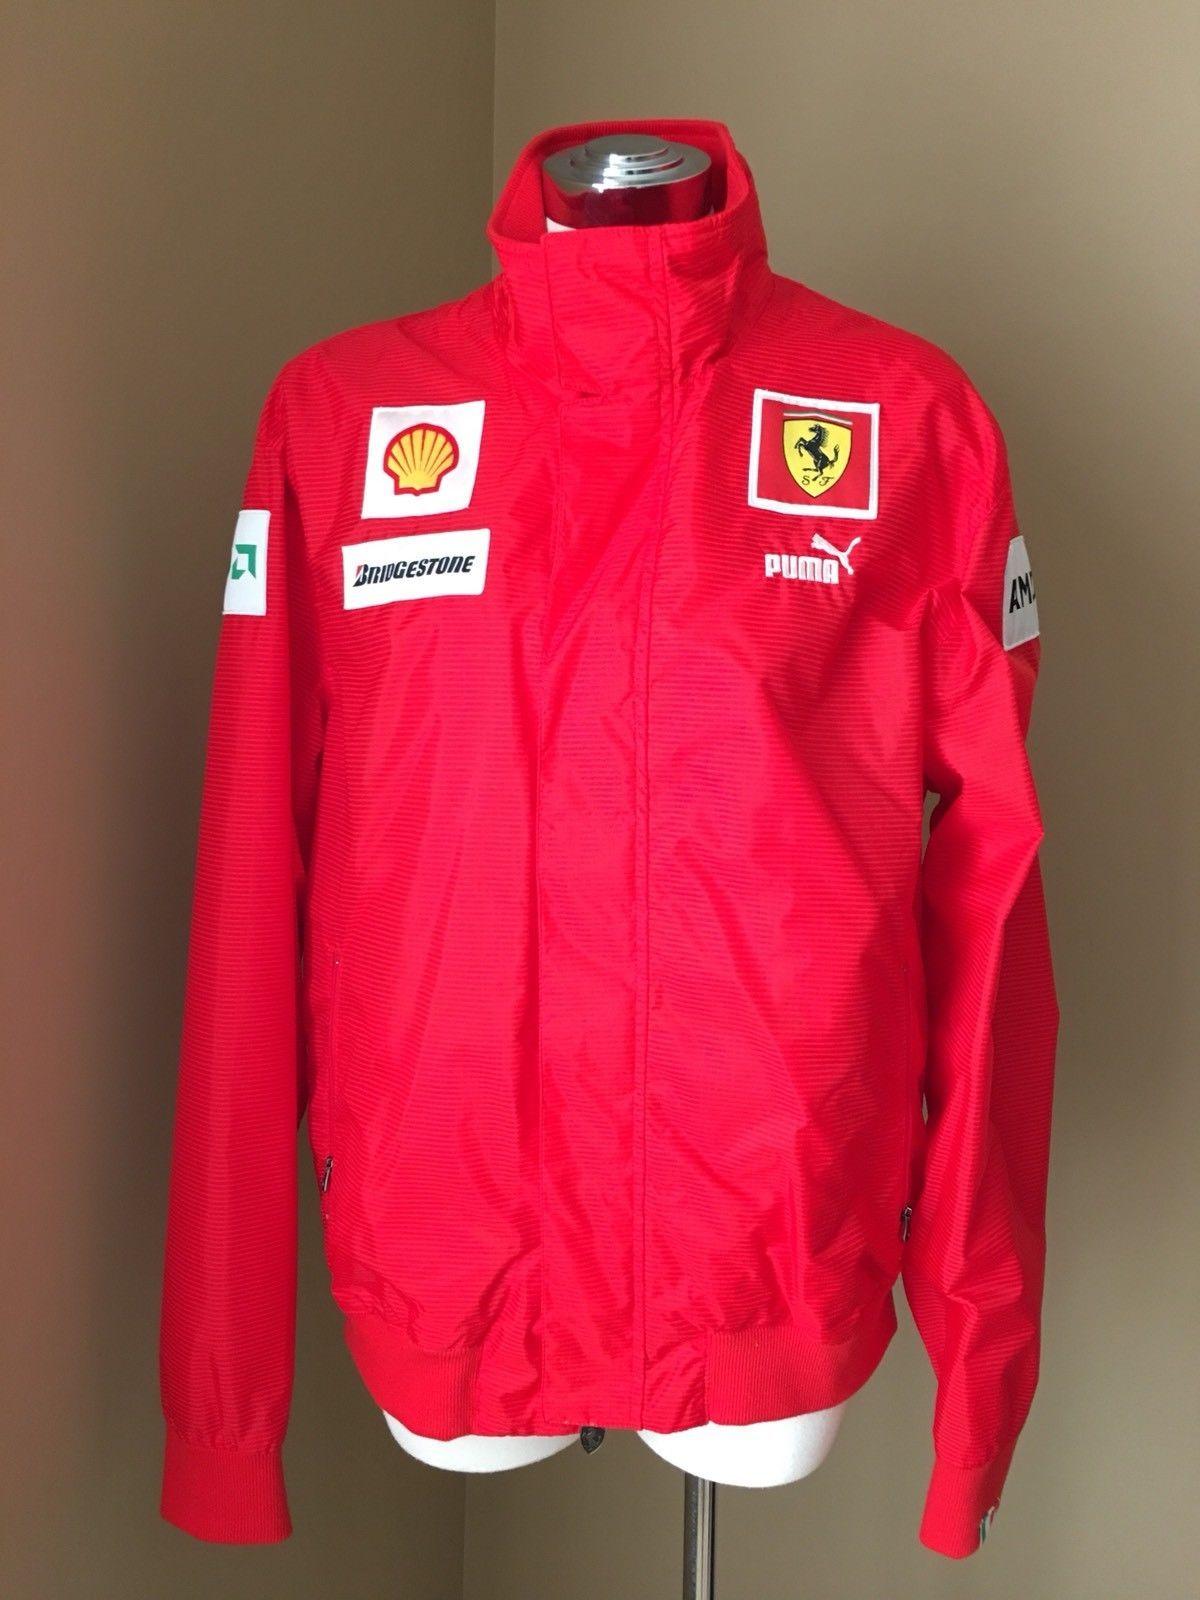 New Puma Red Scuderia Ferrari Jacket Official Licensed Product L 100 Authentic Ebay Jackets Puma Adidas Jacket